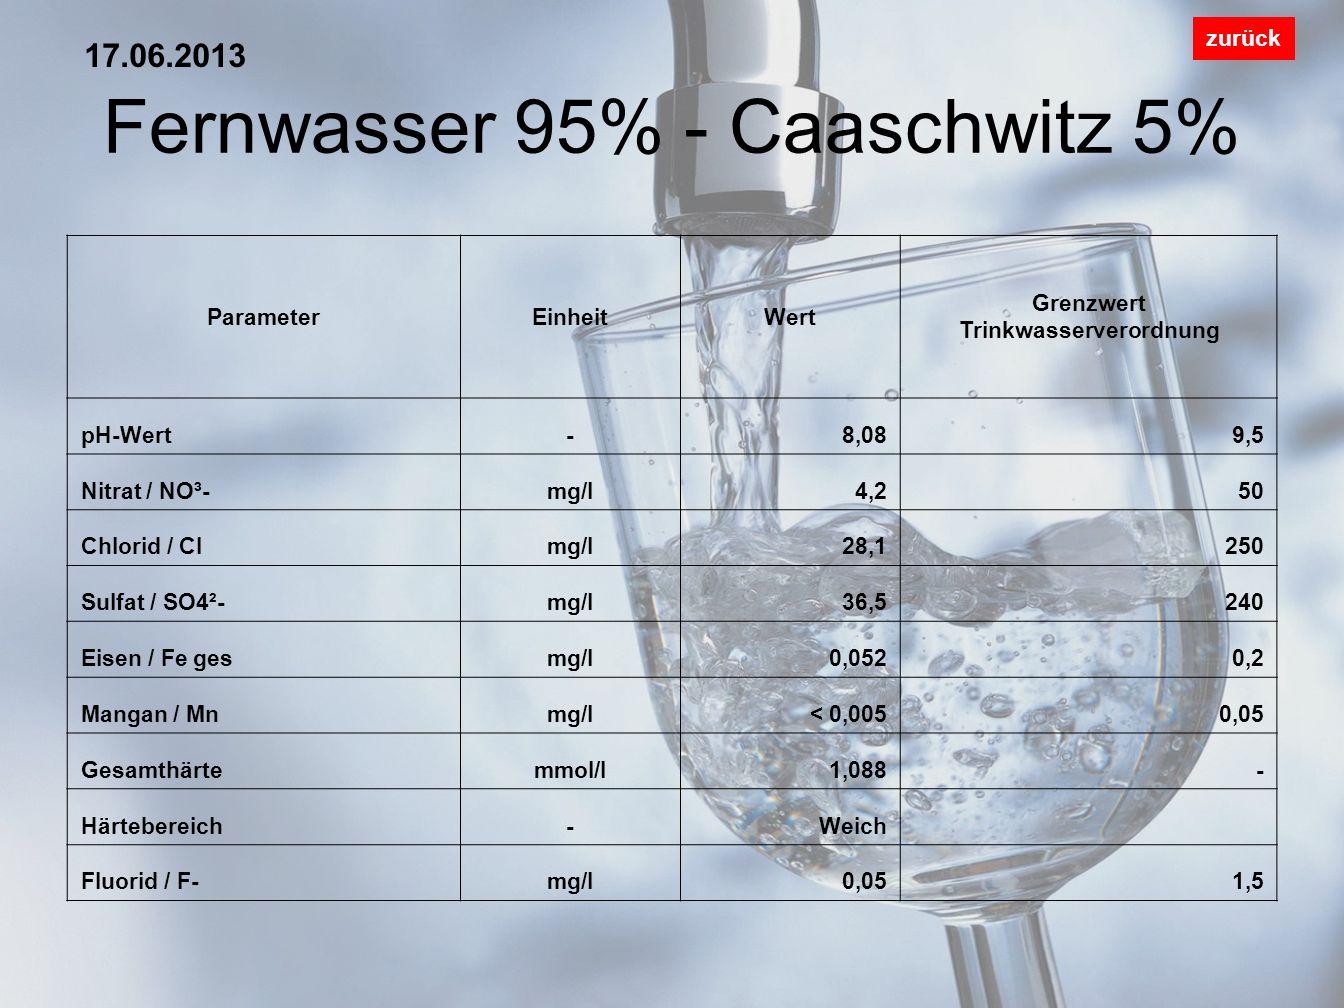 Seifersdorf zurück ParameterEinheitWert Grenzwert Trinkwasserverordnung pH-Wert-7,619,5 Nitrat / NO³-mg/l33,250 Chlorid / Clmg/l37,2250 Sulfat / SO4²-mg/l101240 Eisen / Fe gesmg/l0,0440,2 Mangan / Mnmg/l<0,0050,05 Gesamthärtemmol/l4,539- Härtebereich-Hart Fluorid / F-mg/l0,151,5 18.03.2013